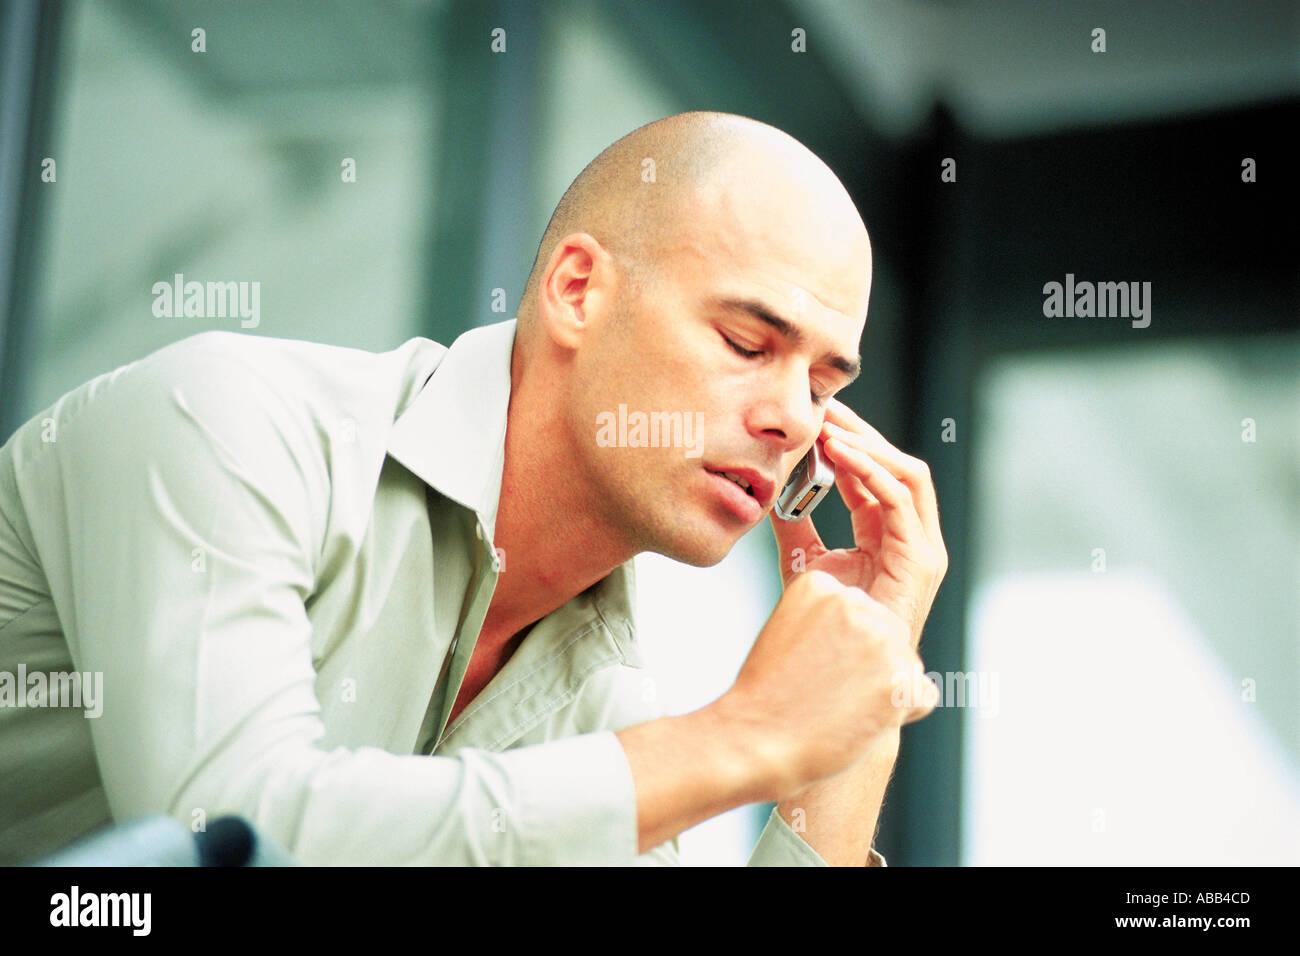 Man on cellphone - Stock Image